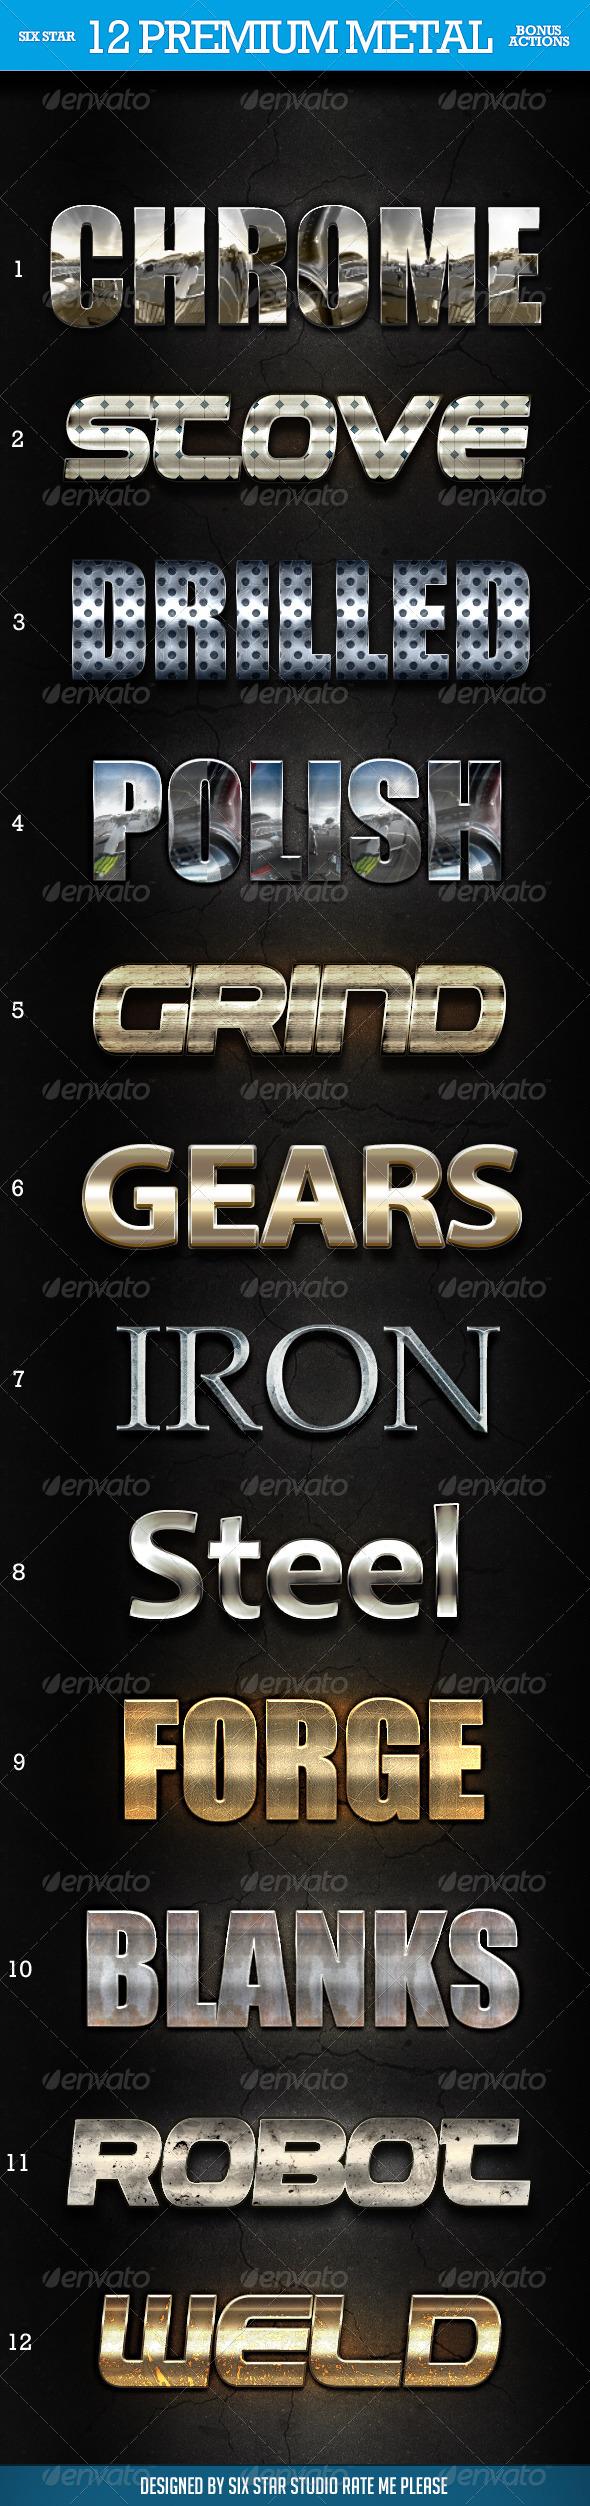 12 Premium Metal Styles - Styles Photoshop